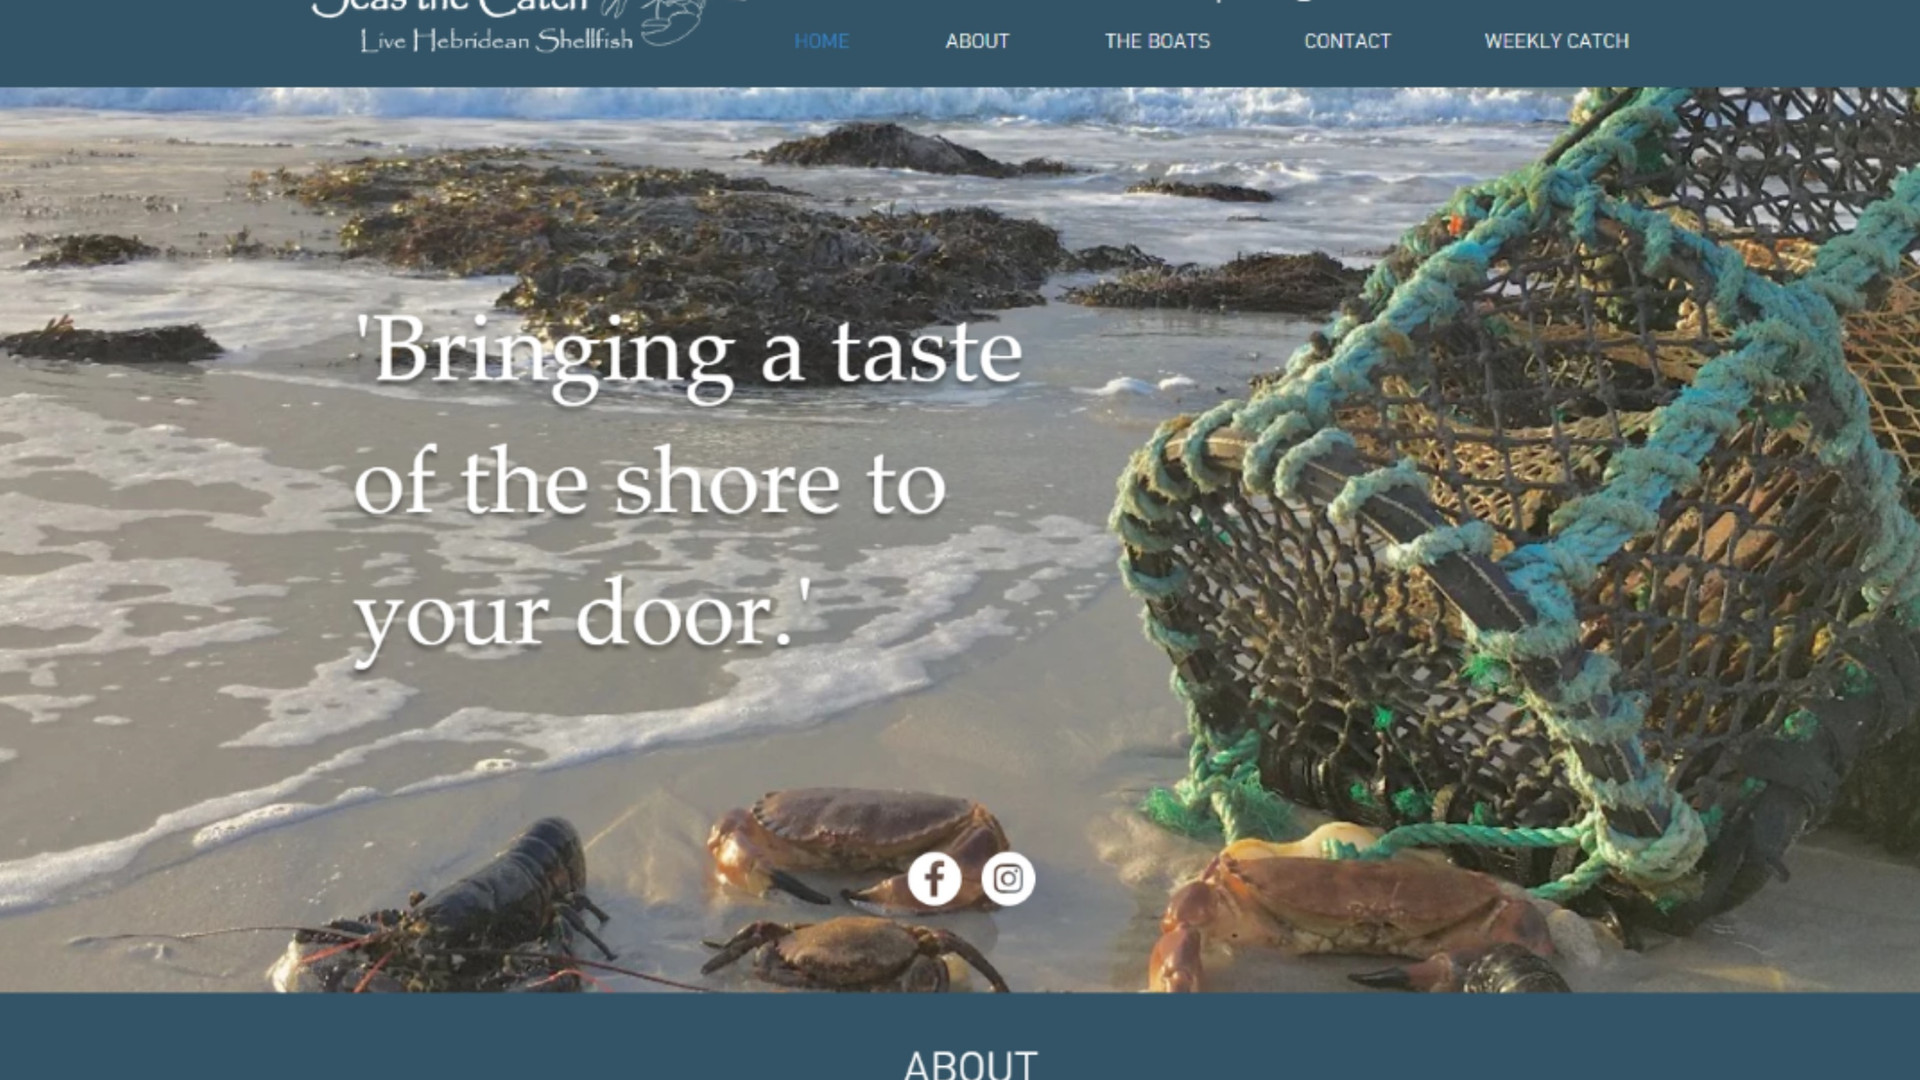 Seas the Catch - Website